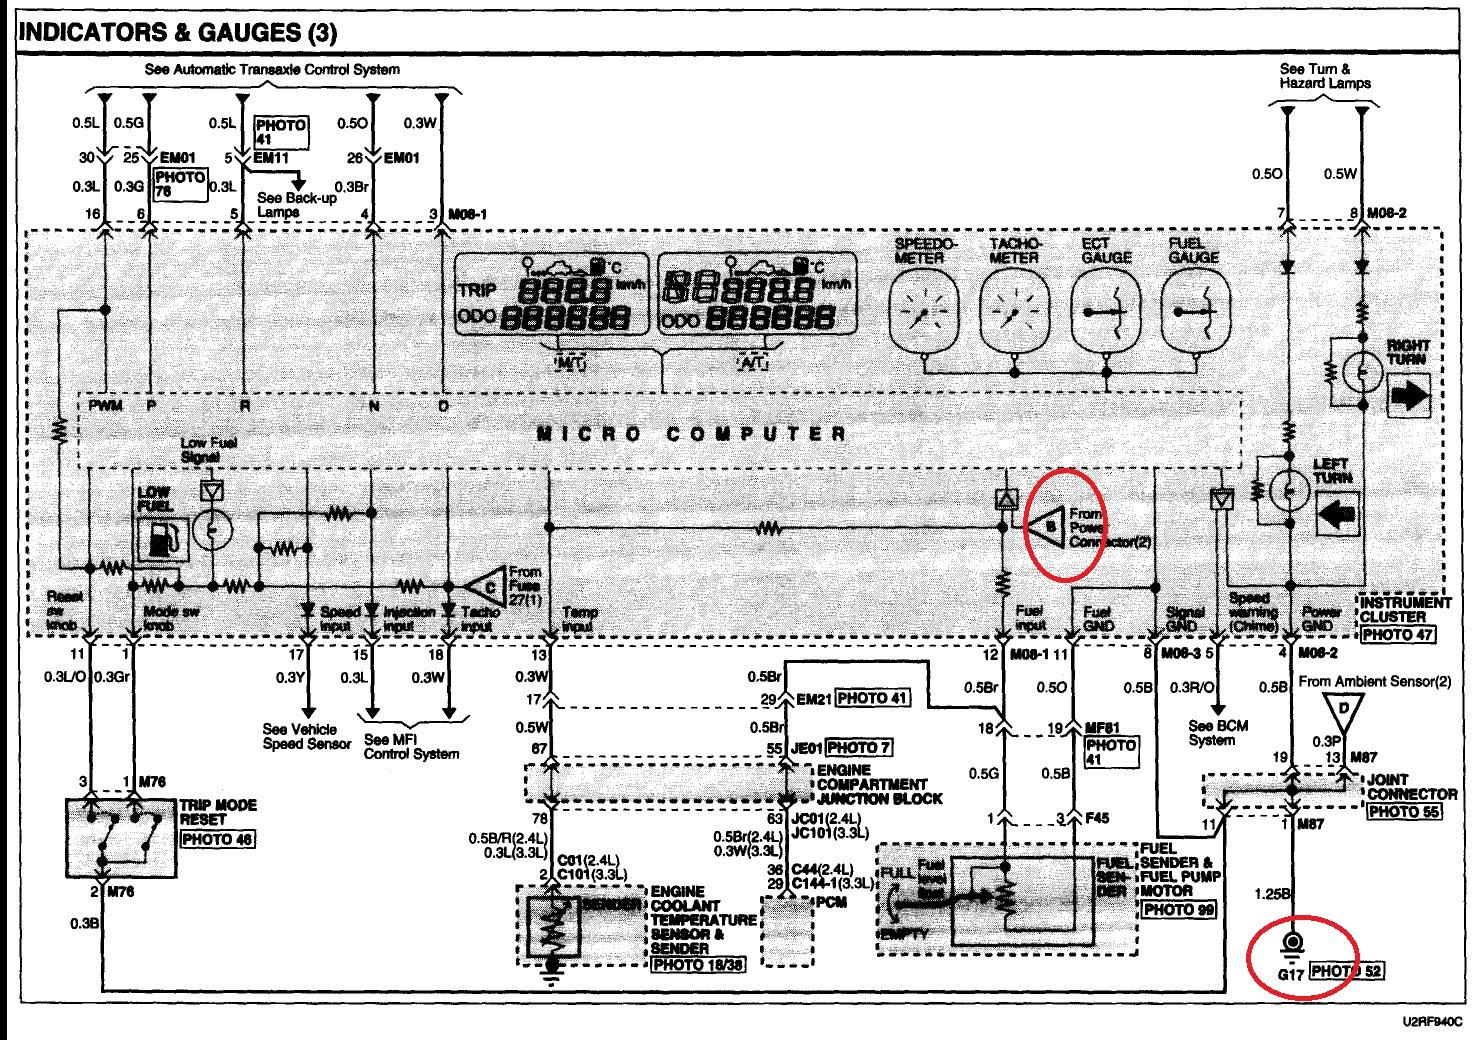 Wiring Diagram Hyundai Santum Fe 2004 - Wiring Diagram Schemas